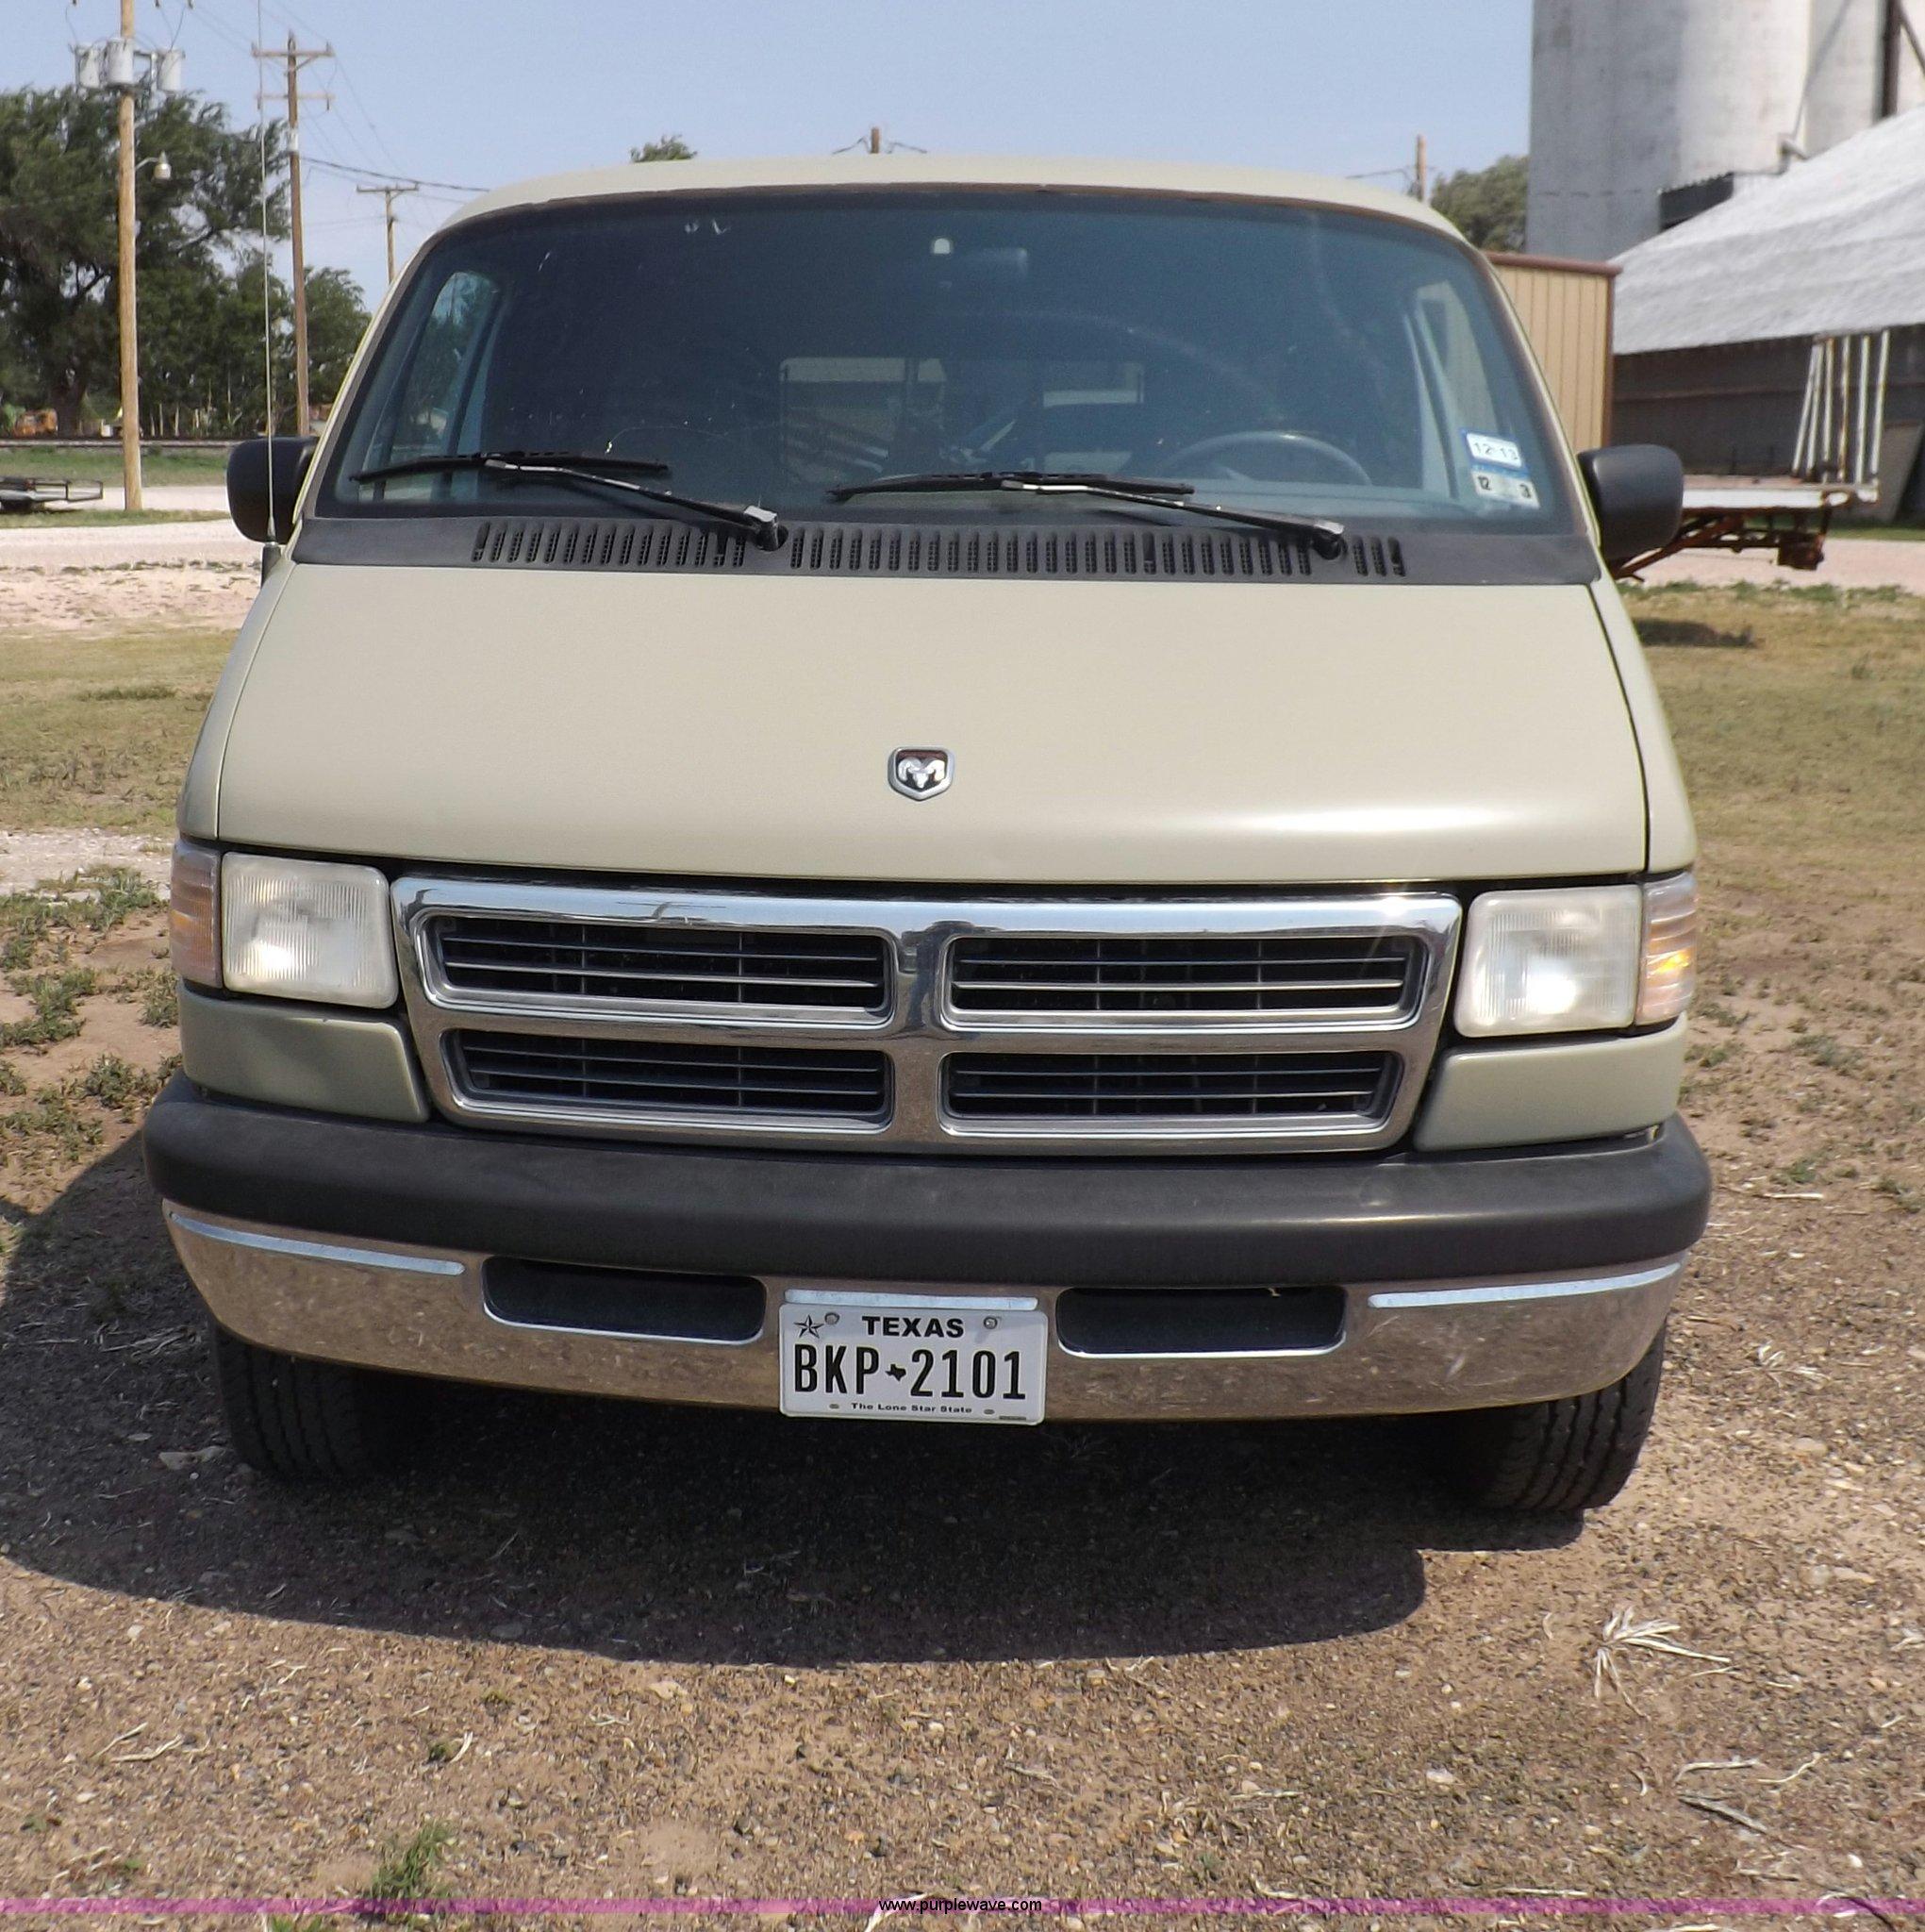 1997 dodge ram wagon b2500 van full size in new window